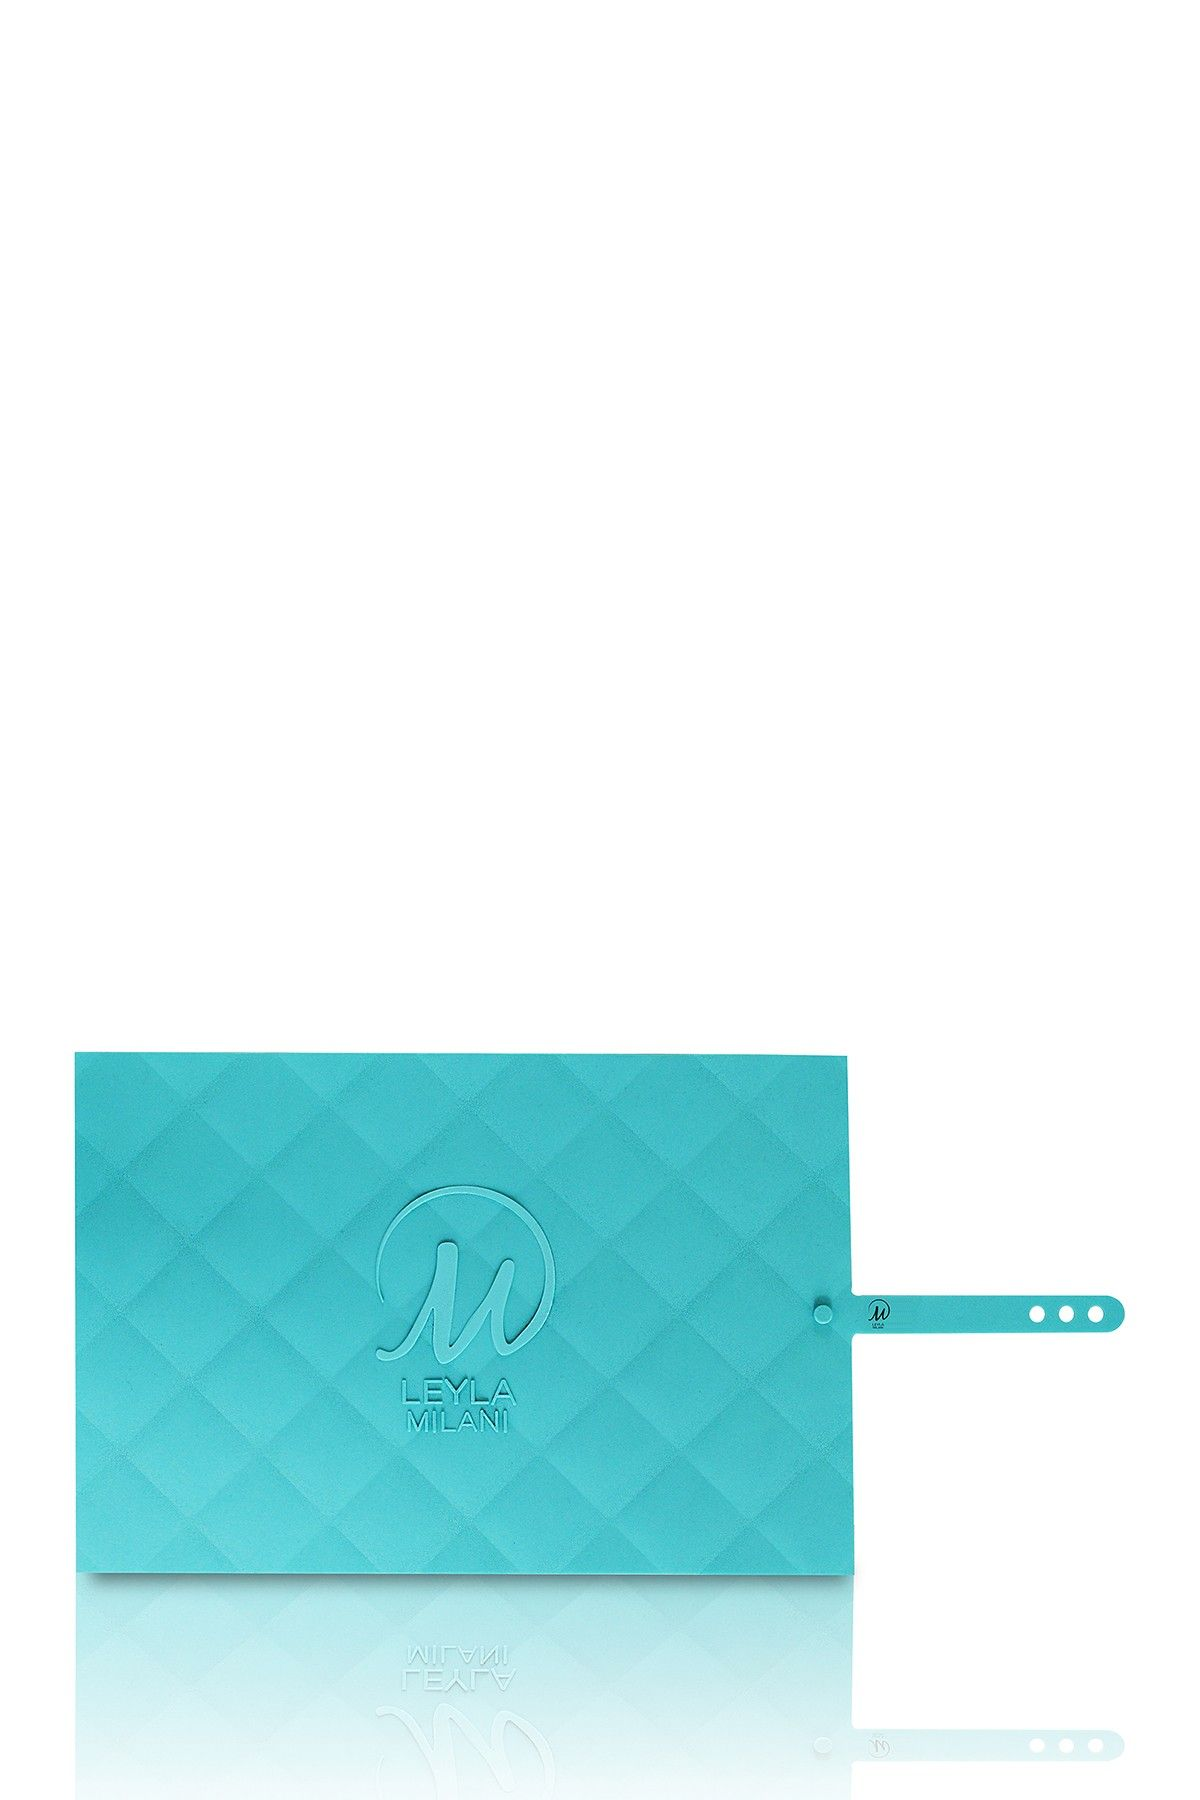 holder resistant mat mats anti slip heat pot silicone white product kitchen of pan